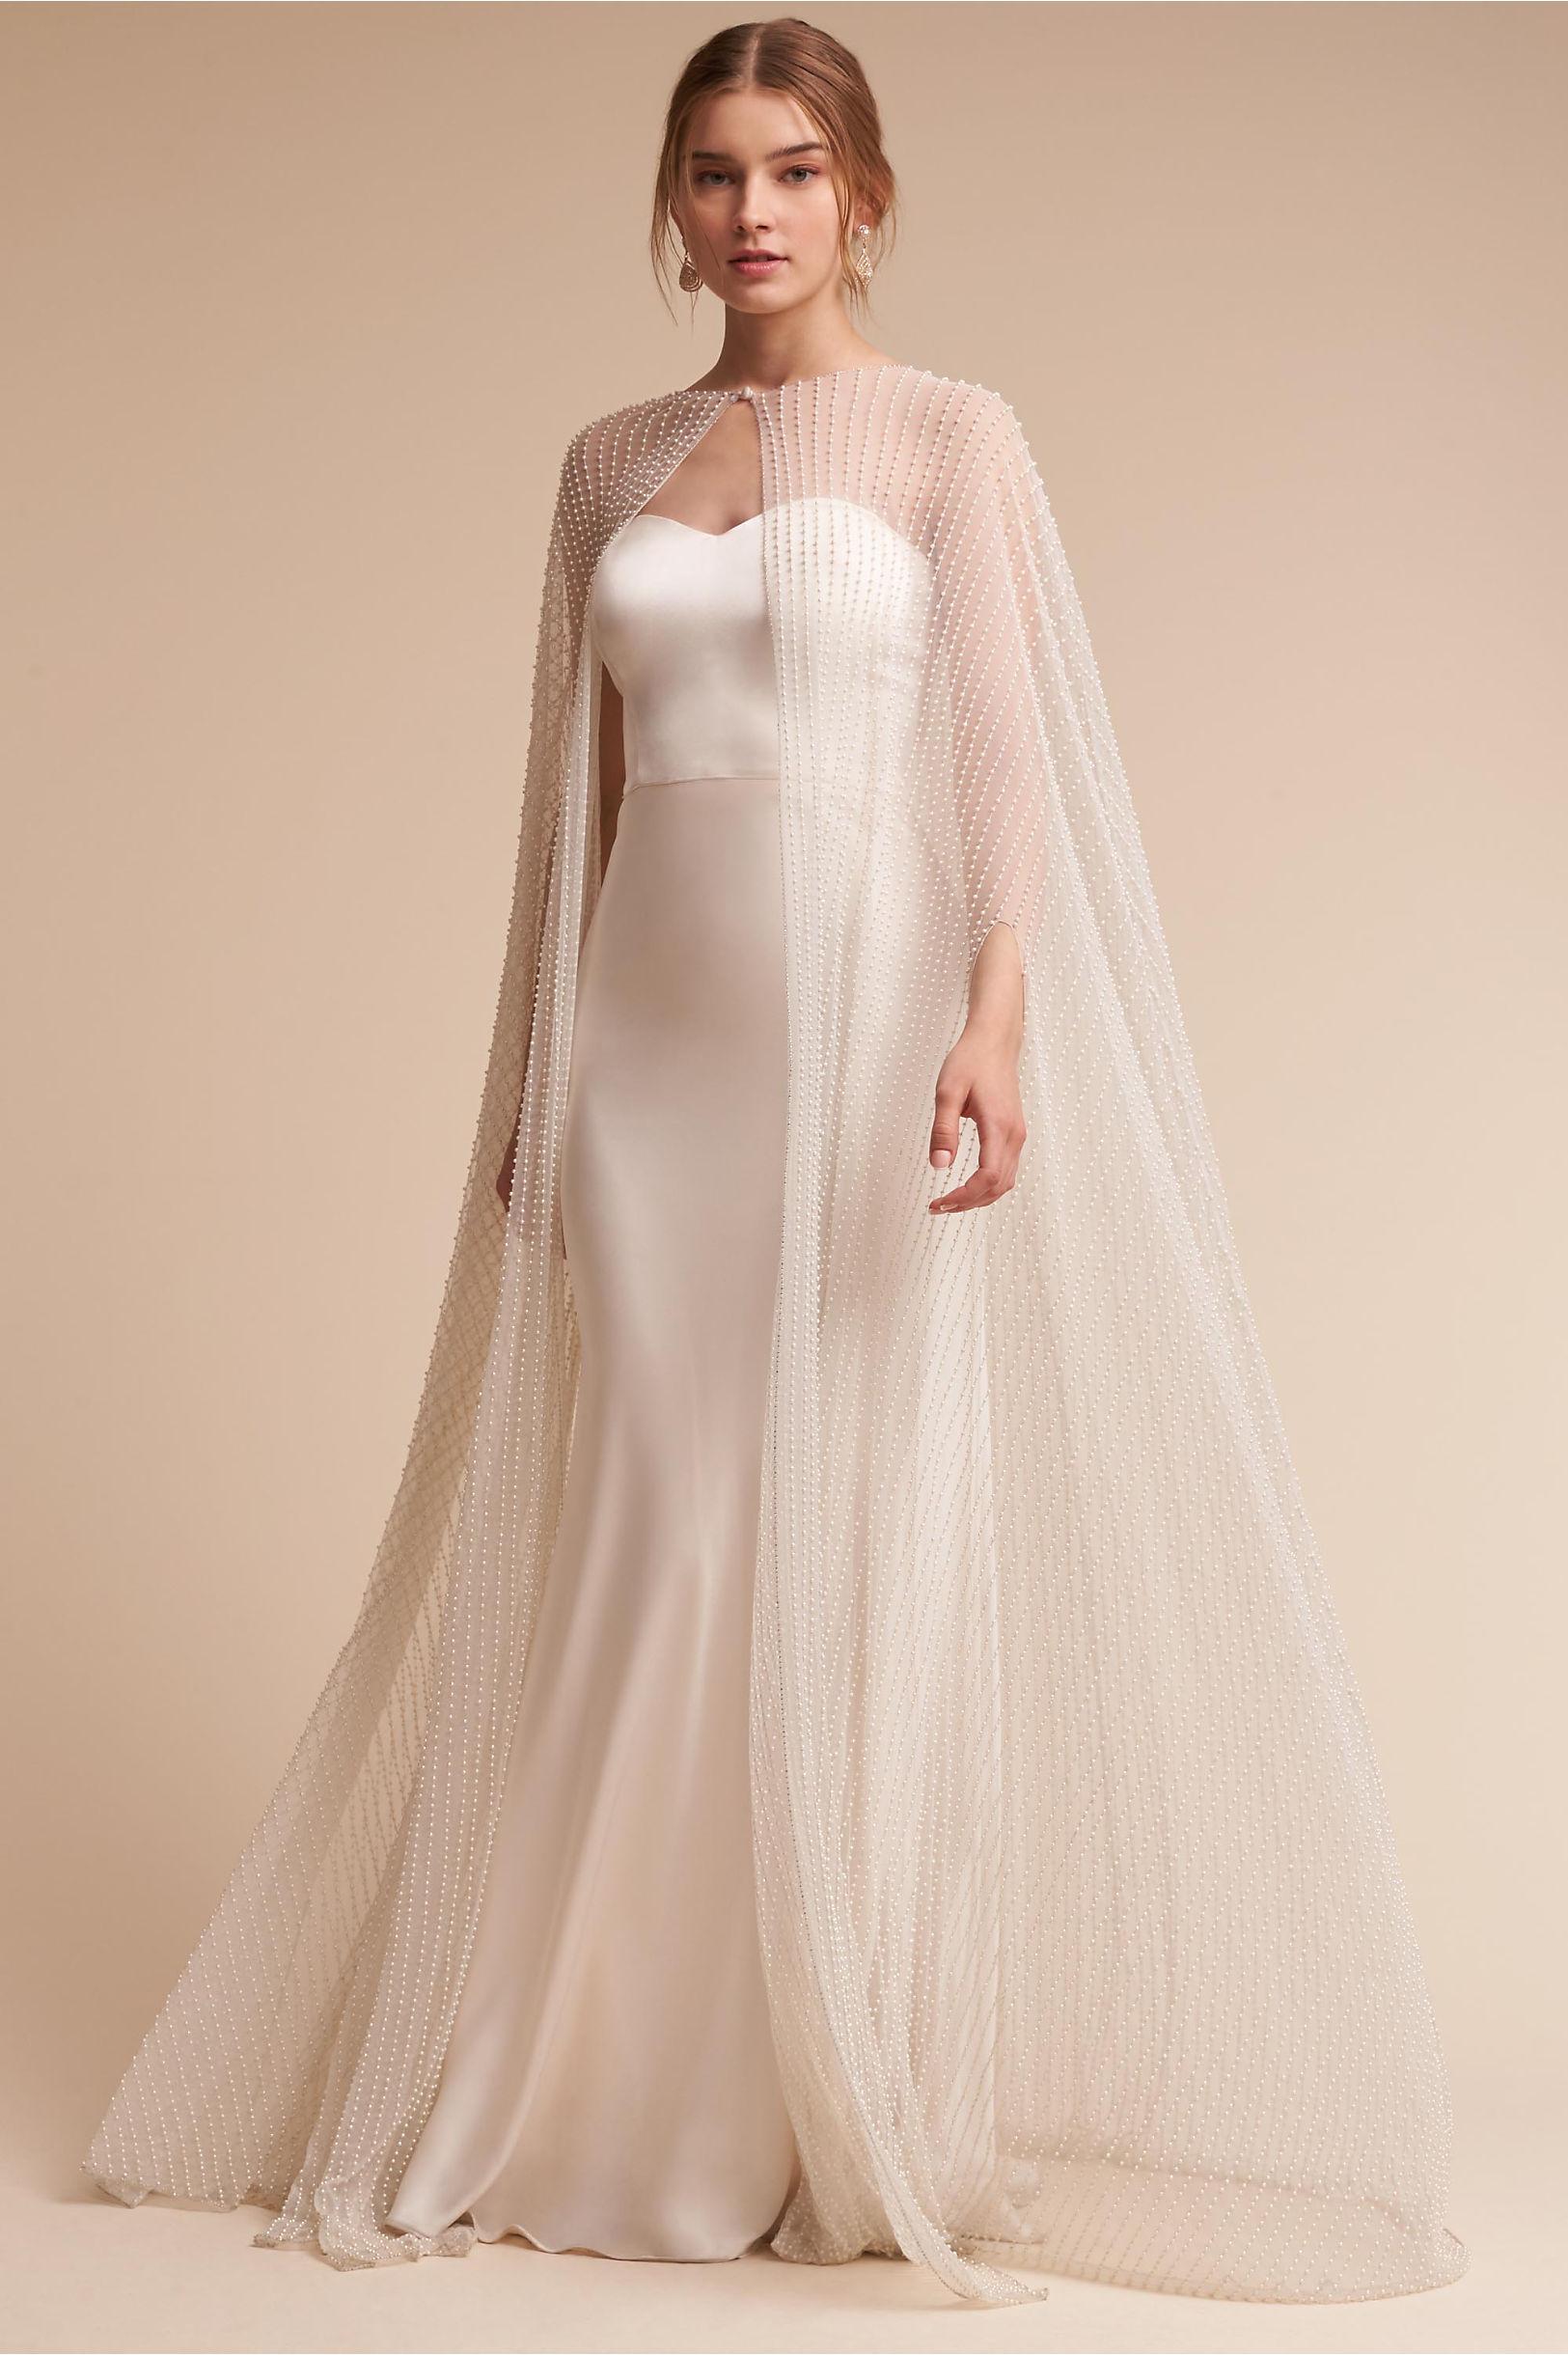 BHLDN Wedding dress and wedding cape las vegas wedding planner green orchid events